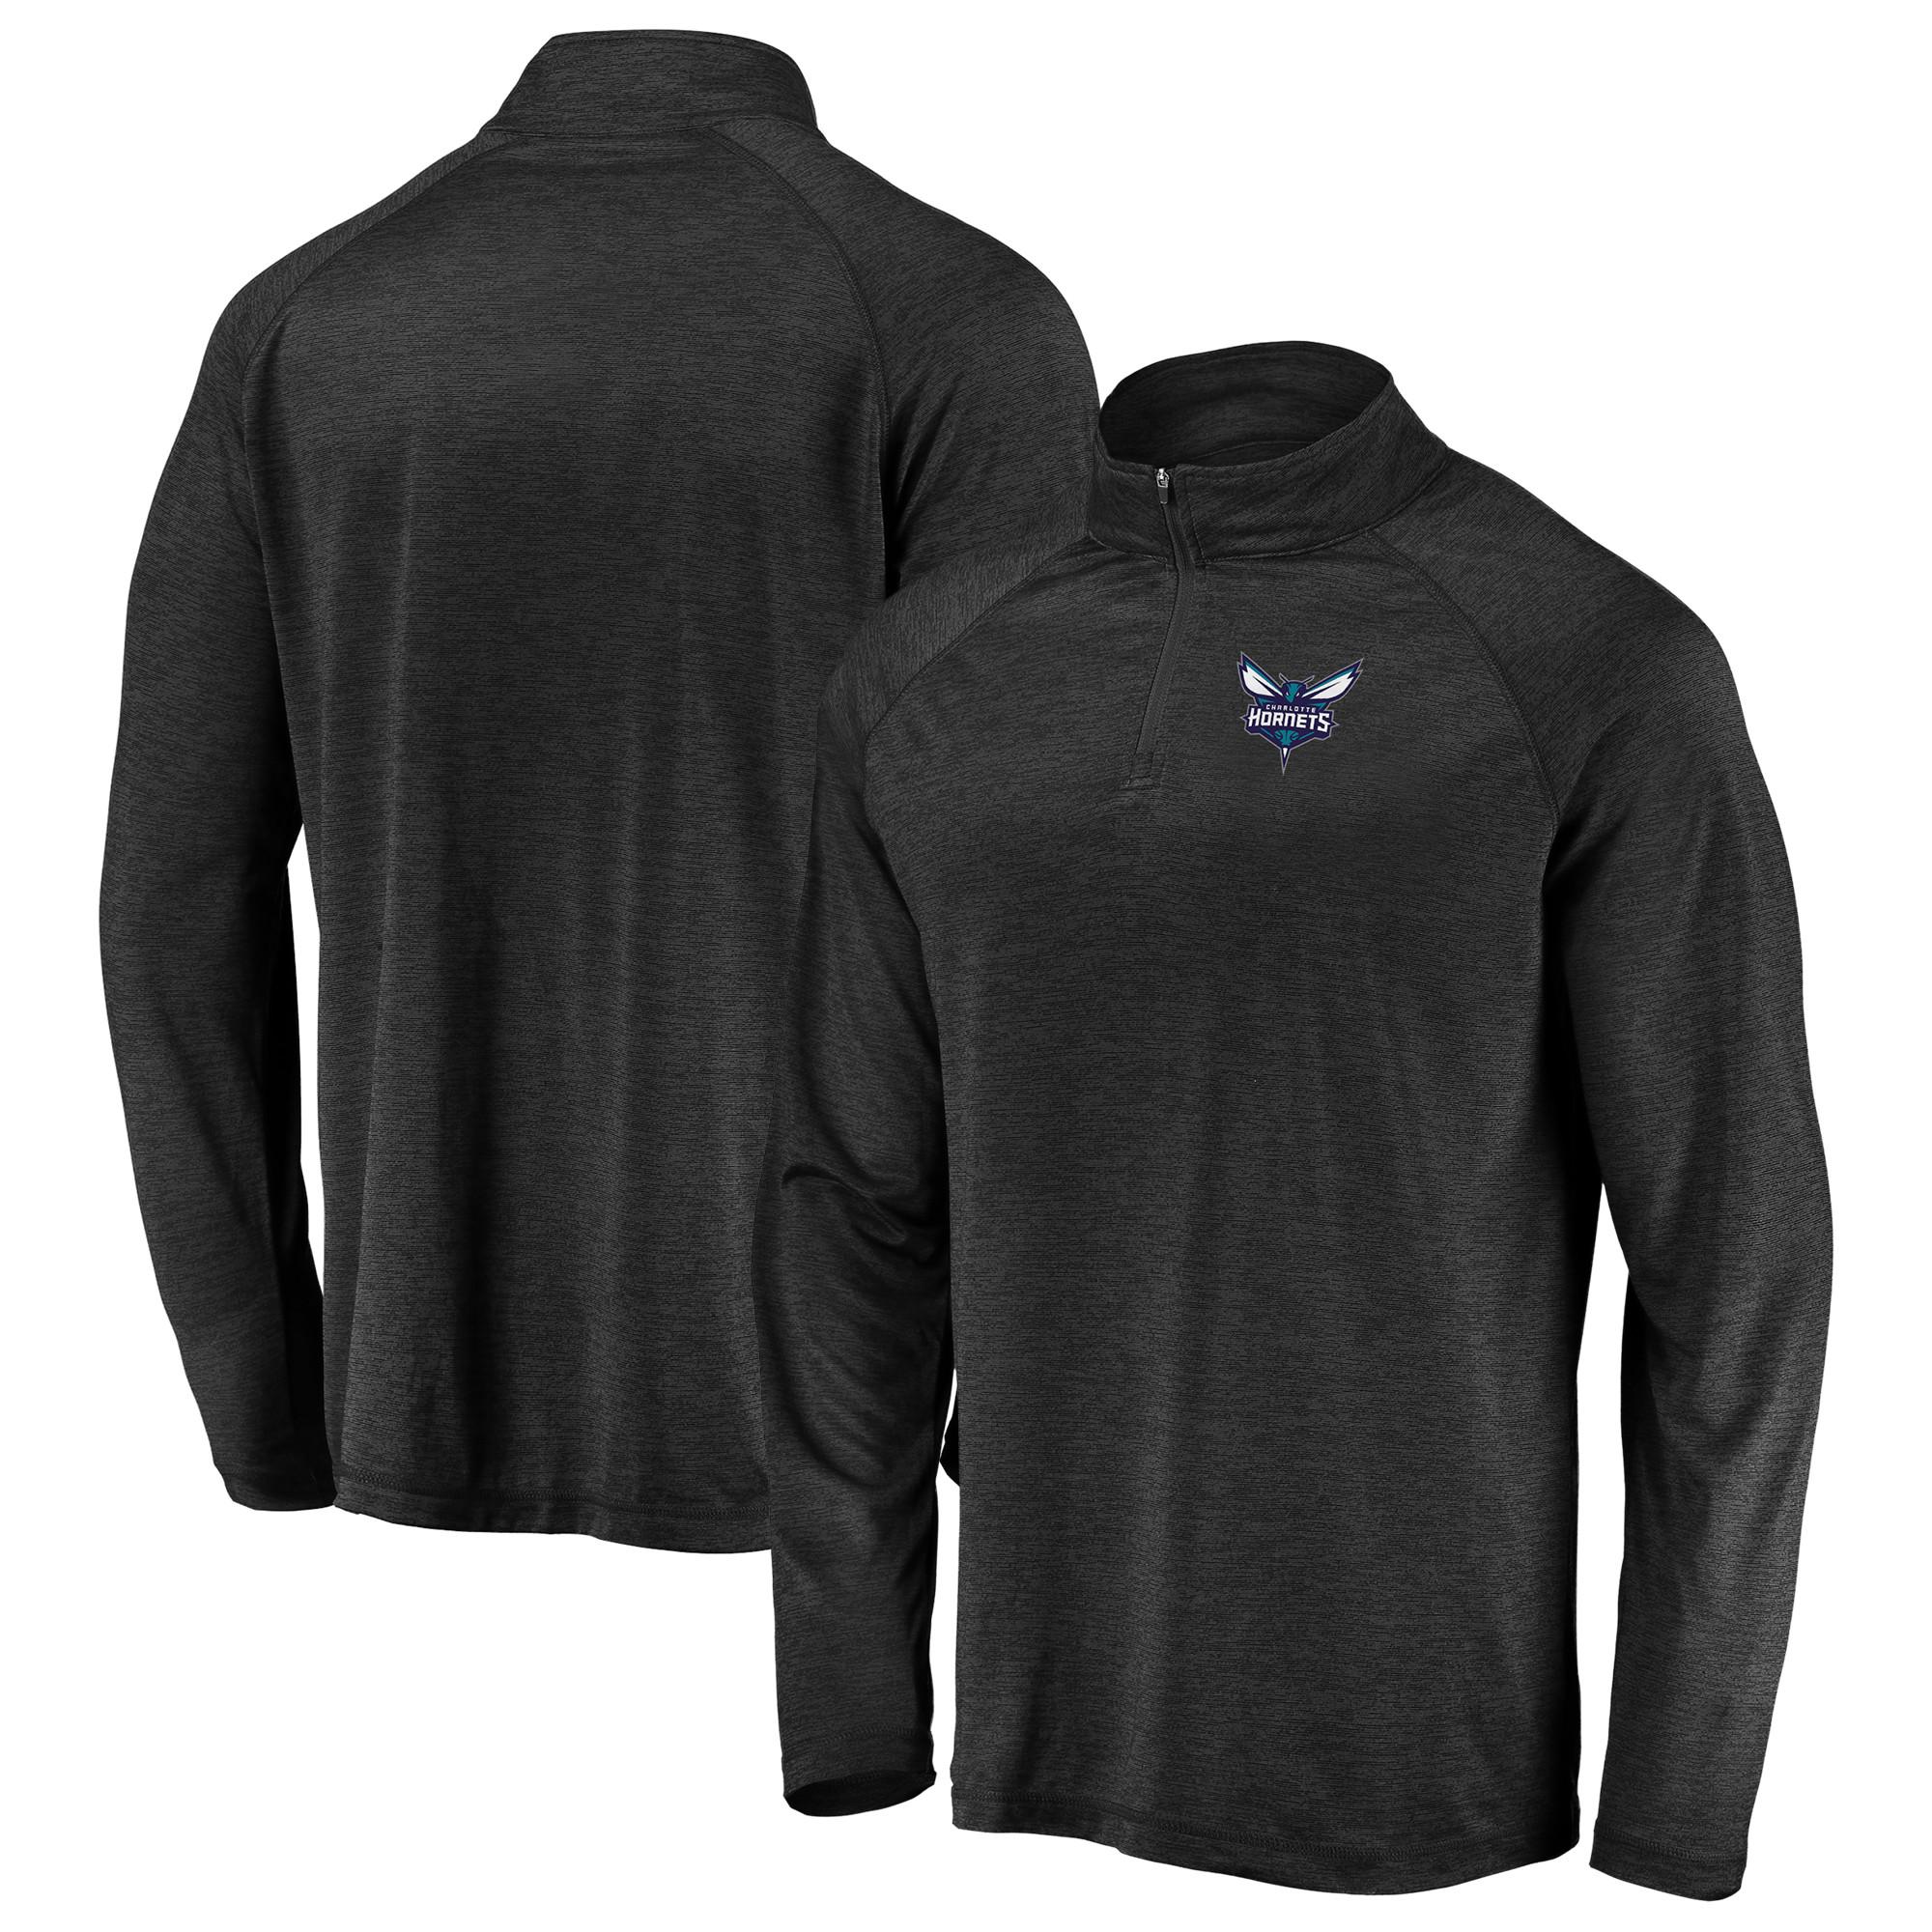 Charlotte Hornets Fanatics Branded Iconic Striated Raglan Quarter-Zip Pullover Jacket - Black